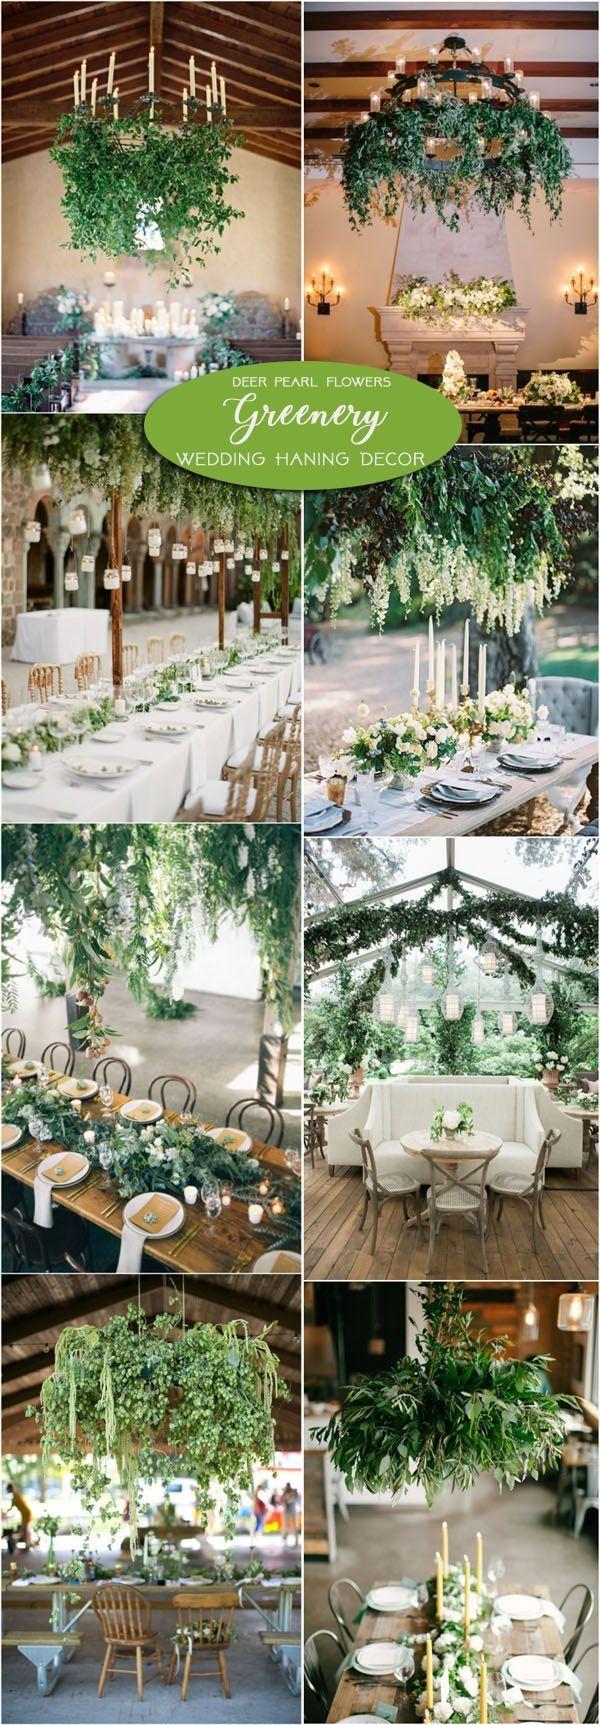 2017 Wedding Trends 100 Greenery Wedding Decor